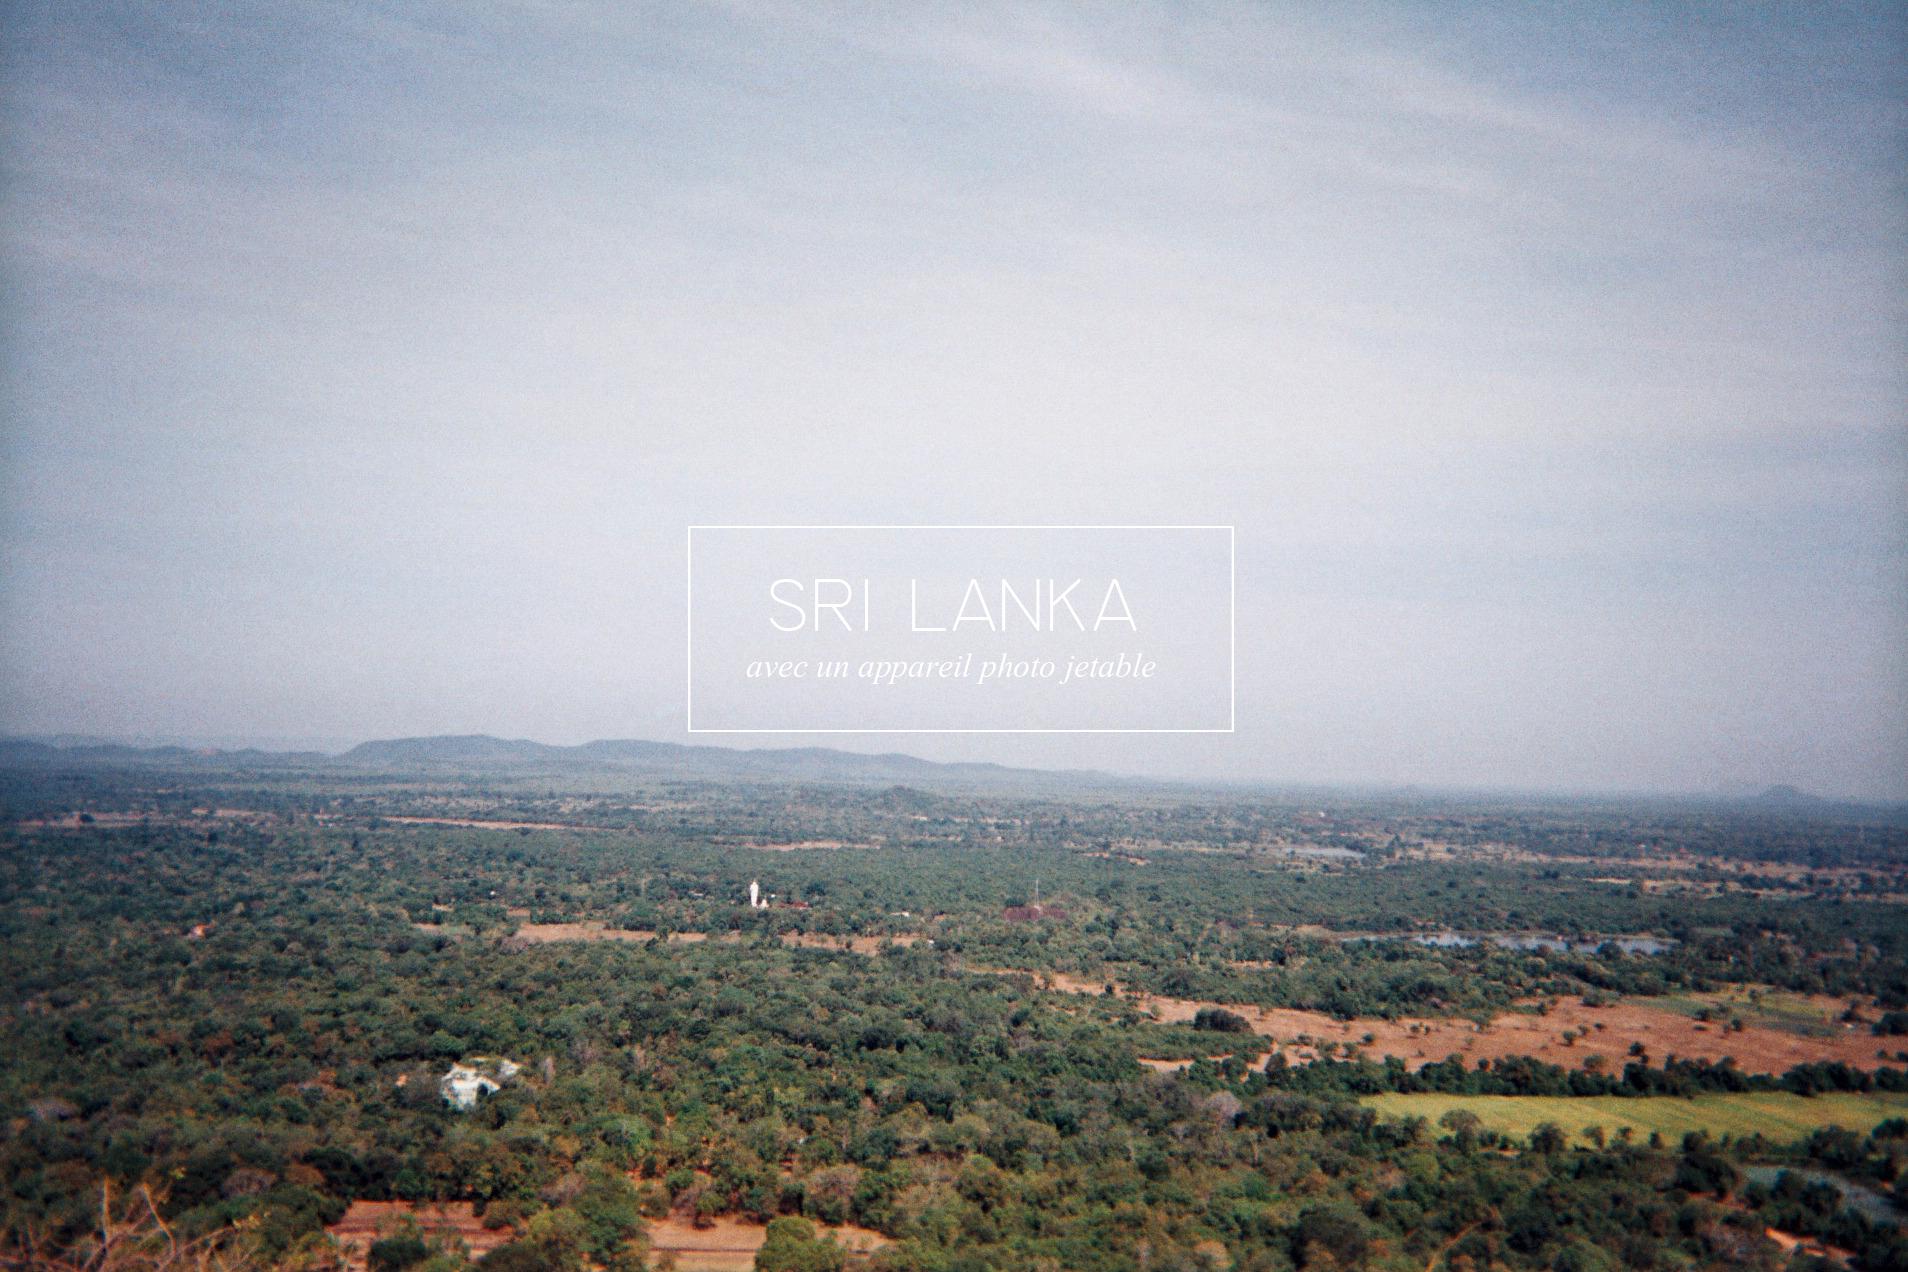 carnet-de-voyage-sri-lanka-sigiriya-by-le-polyedre visuel